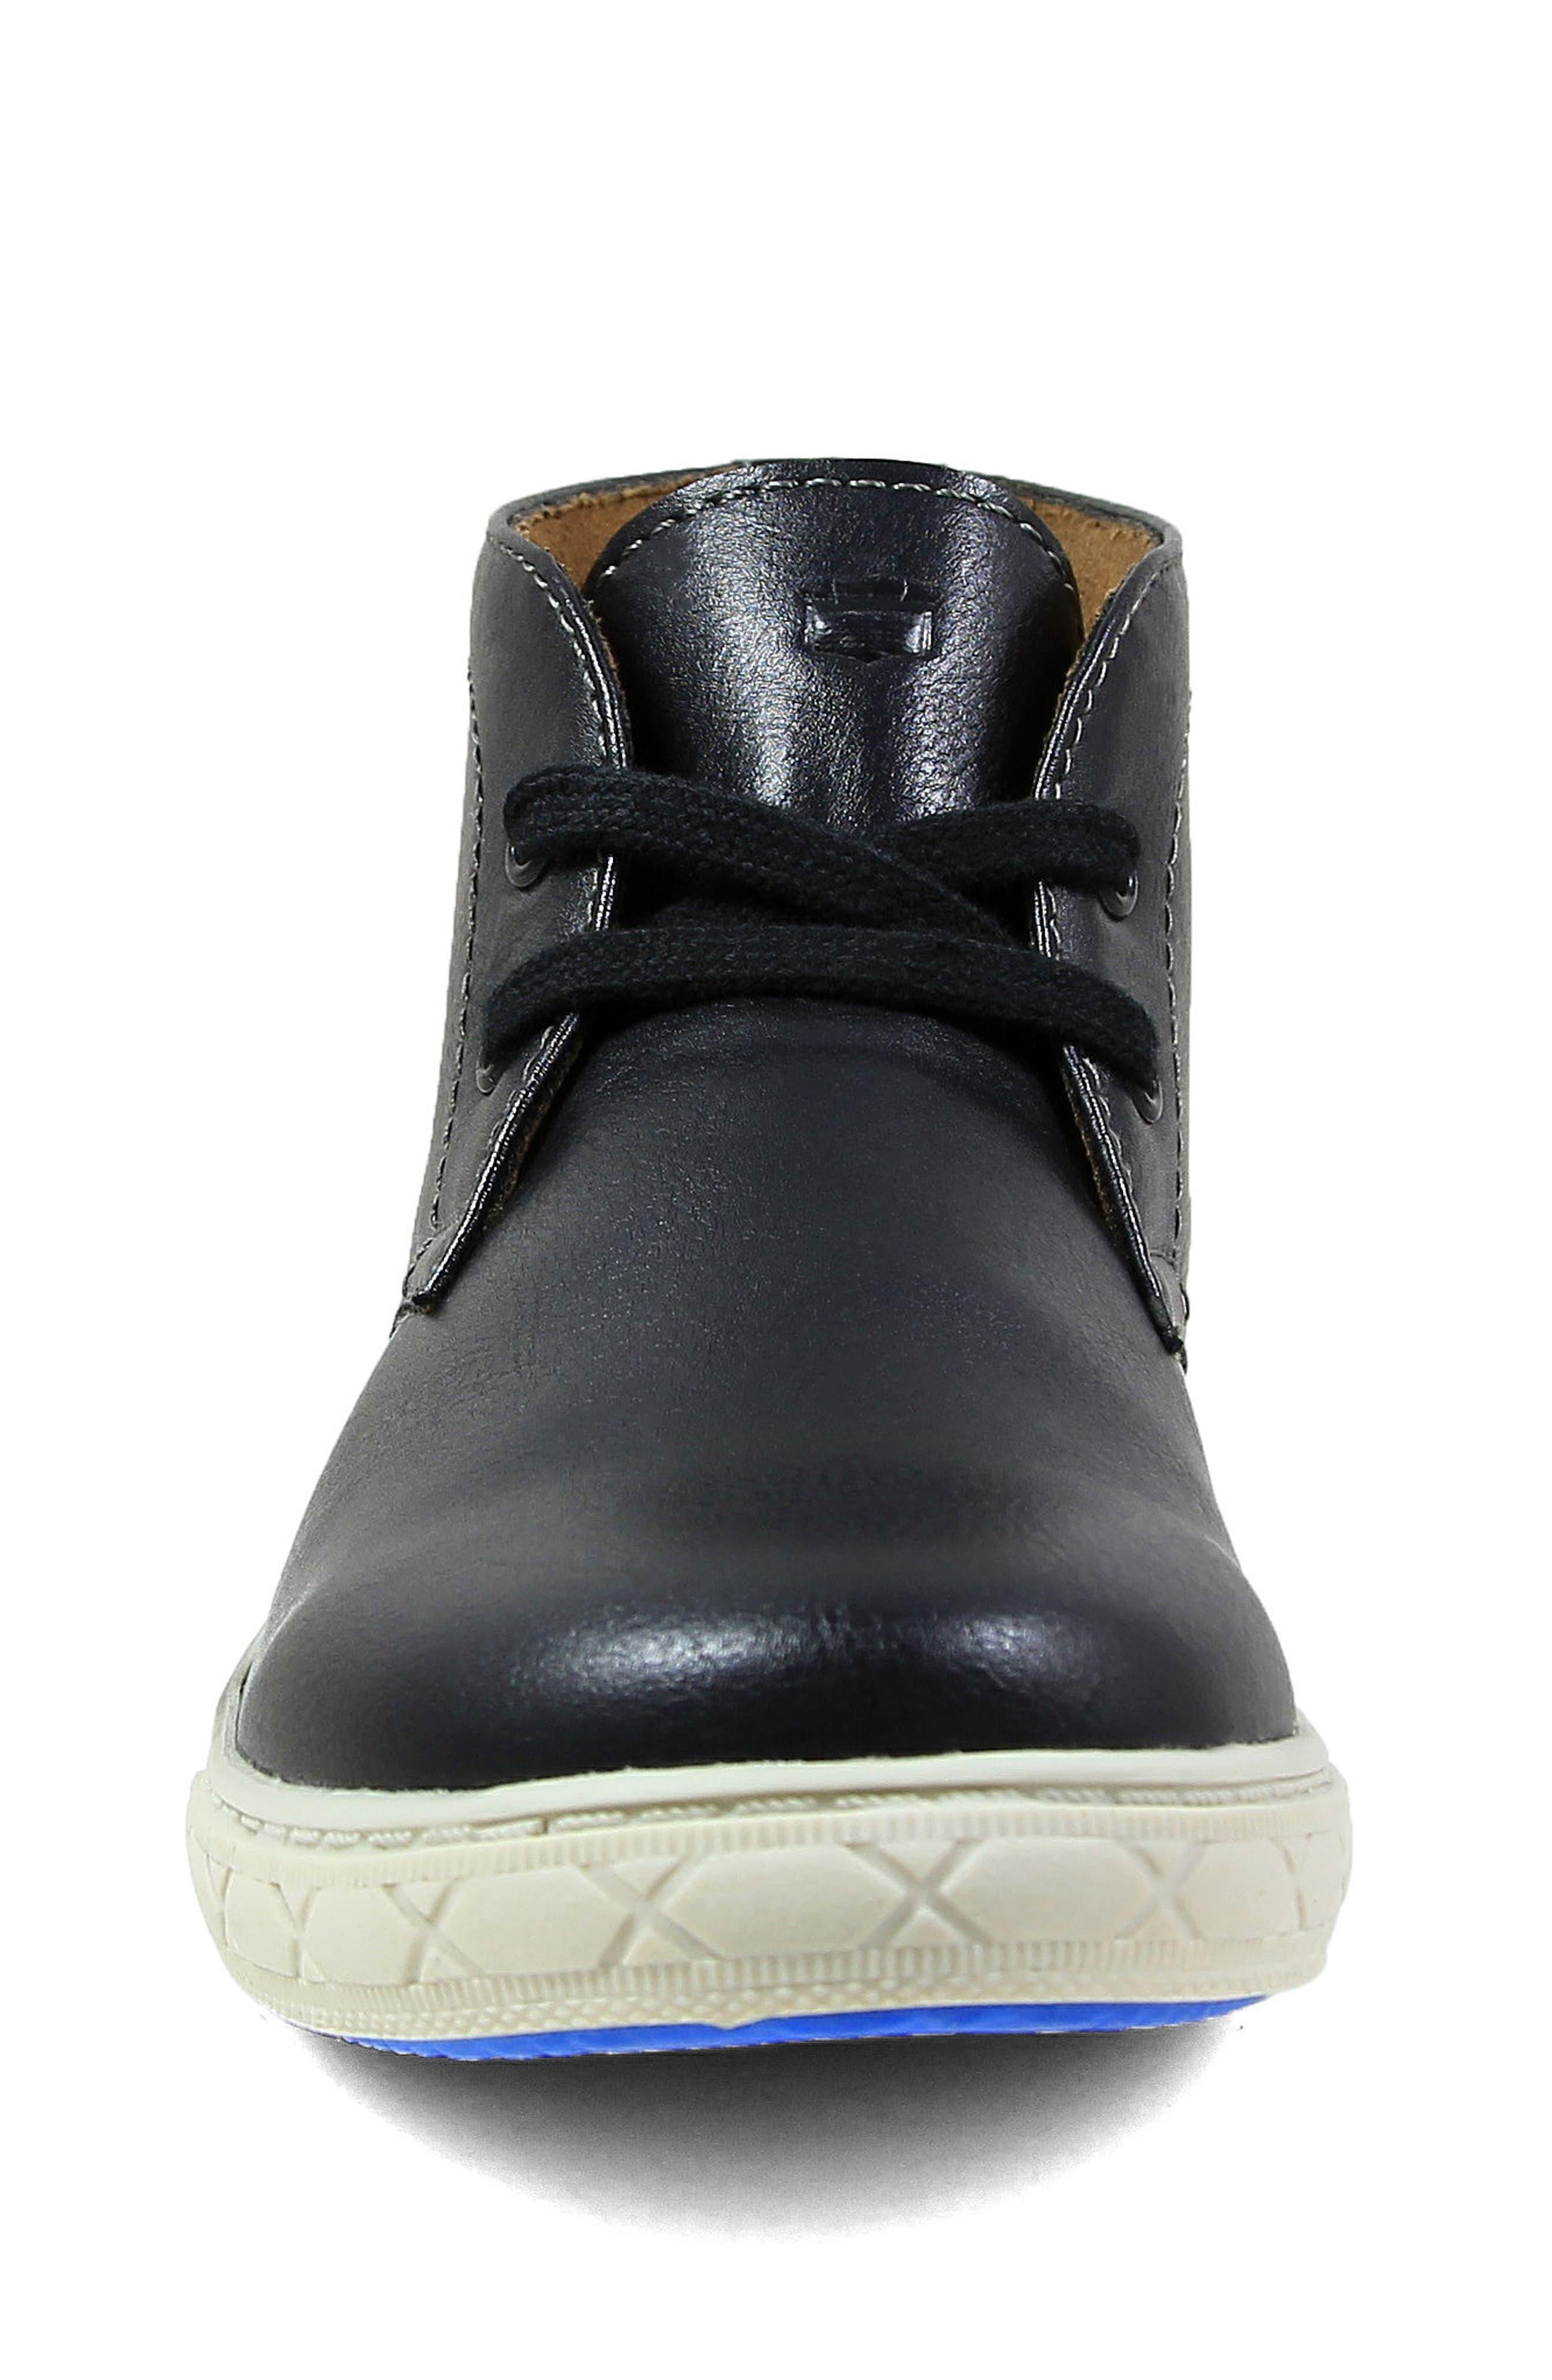 Curb Chukka Sneaker Boot,                             Alternate thumbnail 4, color,                             Black